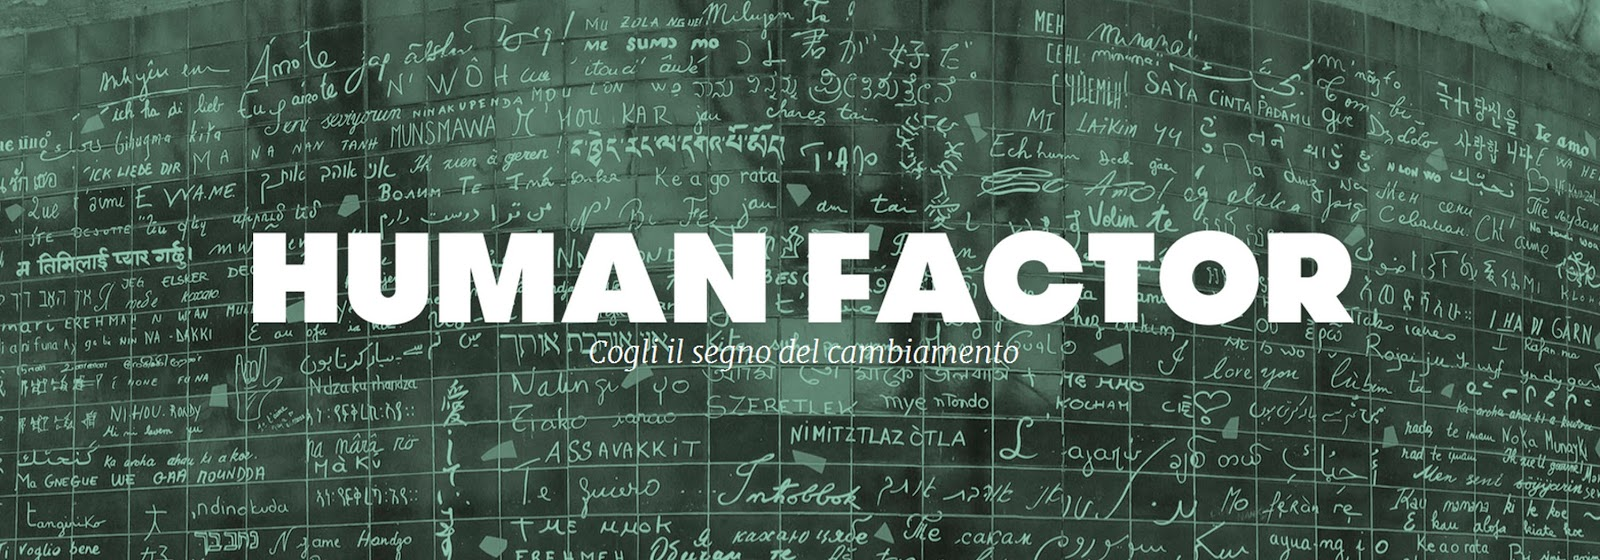 Human_Factor_jafhjhfiaw4if